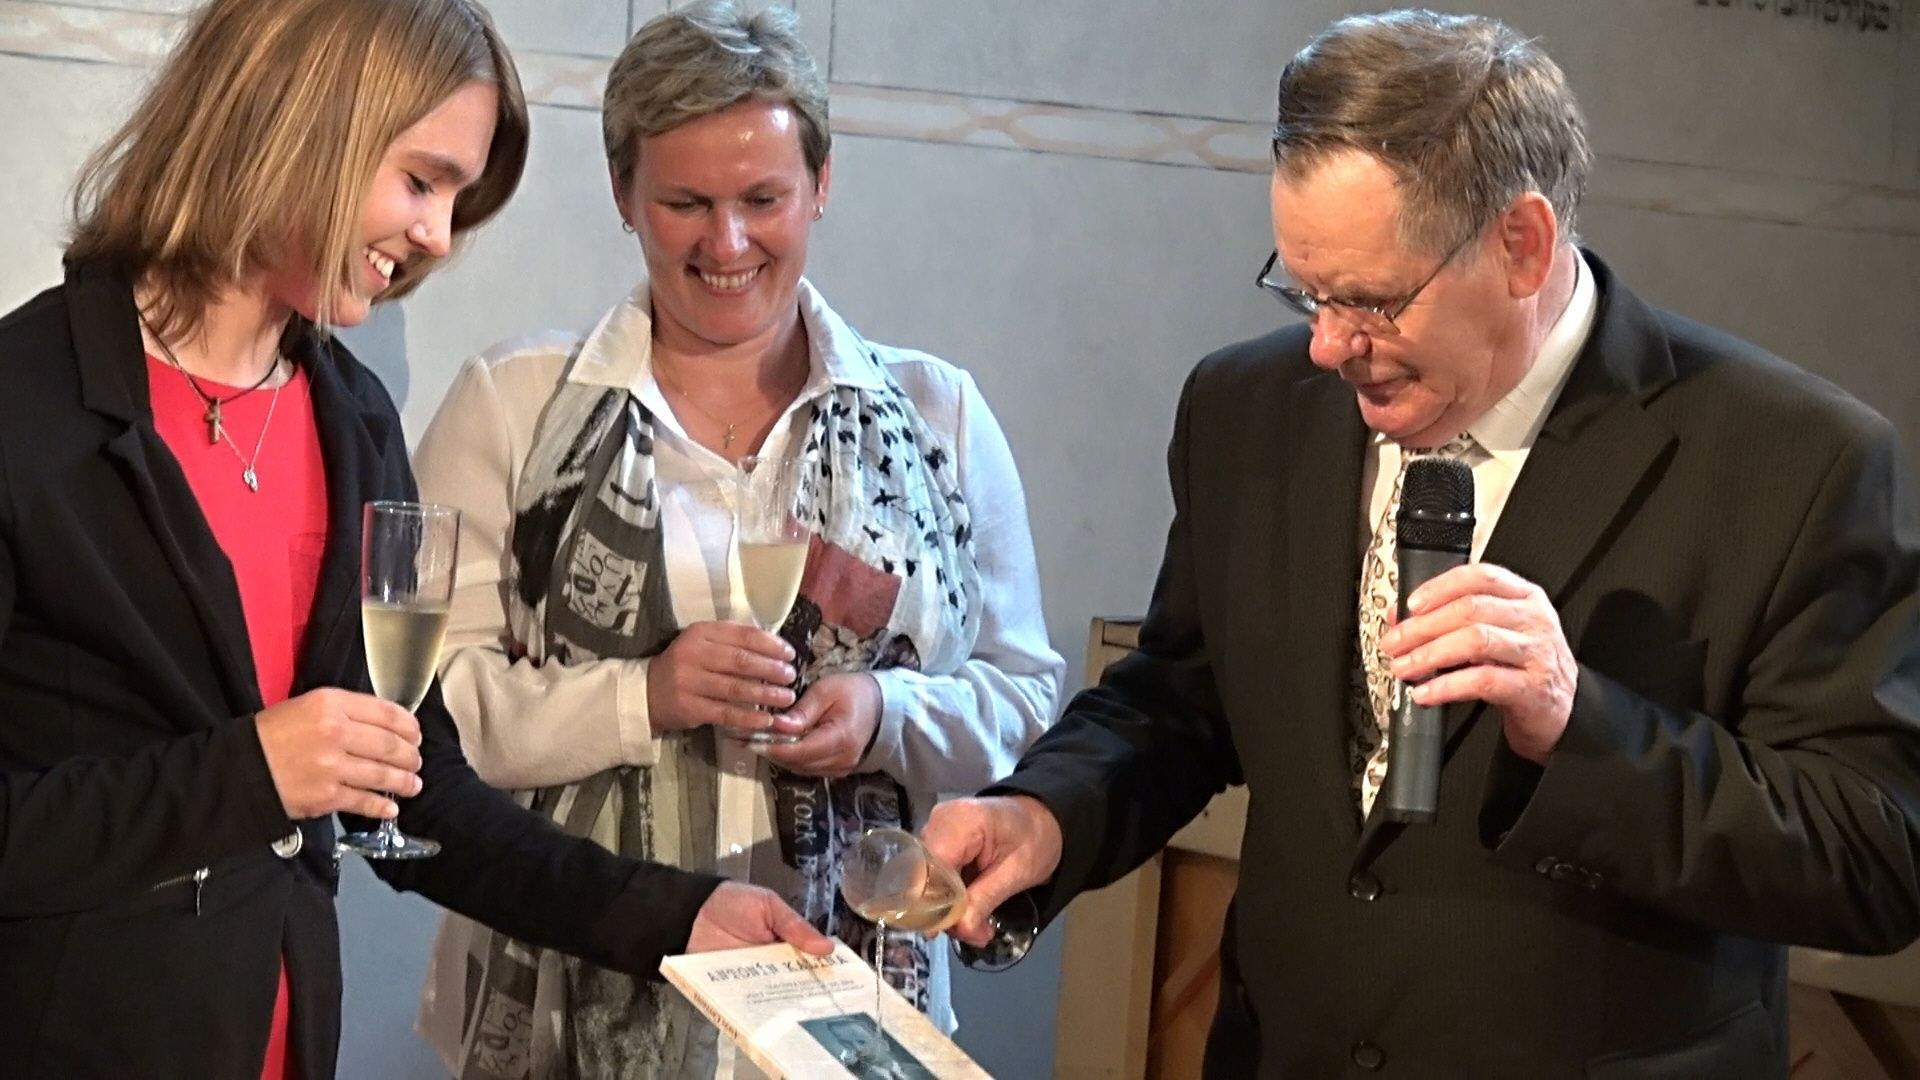 Křest knihy. Foto: trebic.news - František Jůza